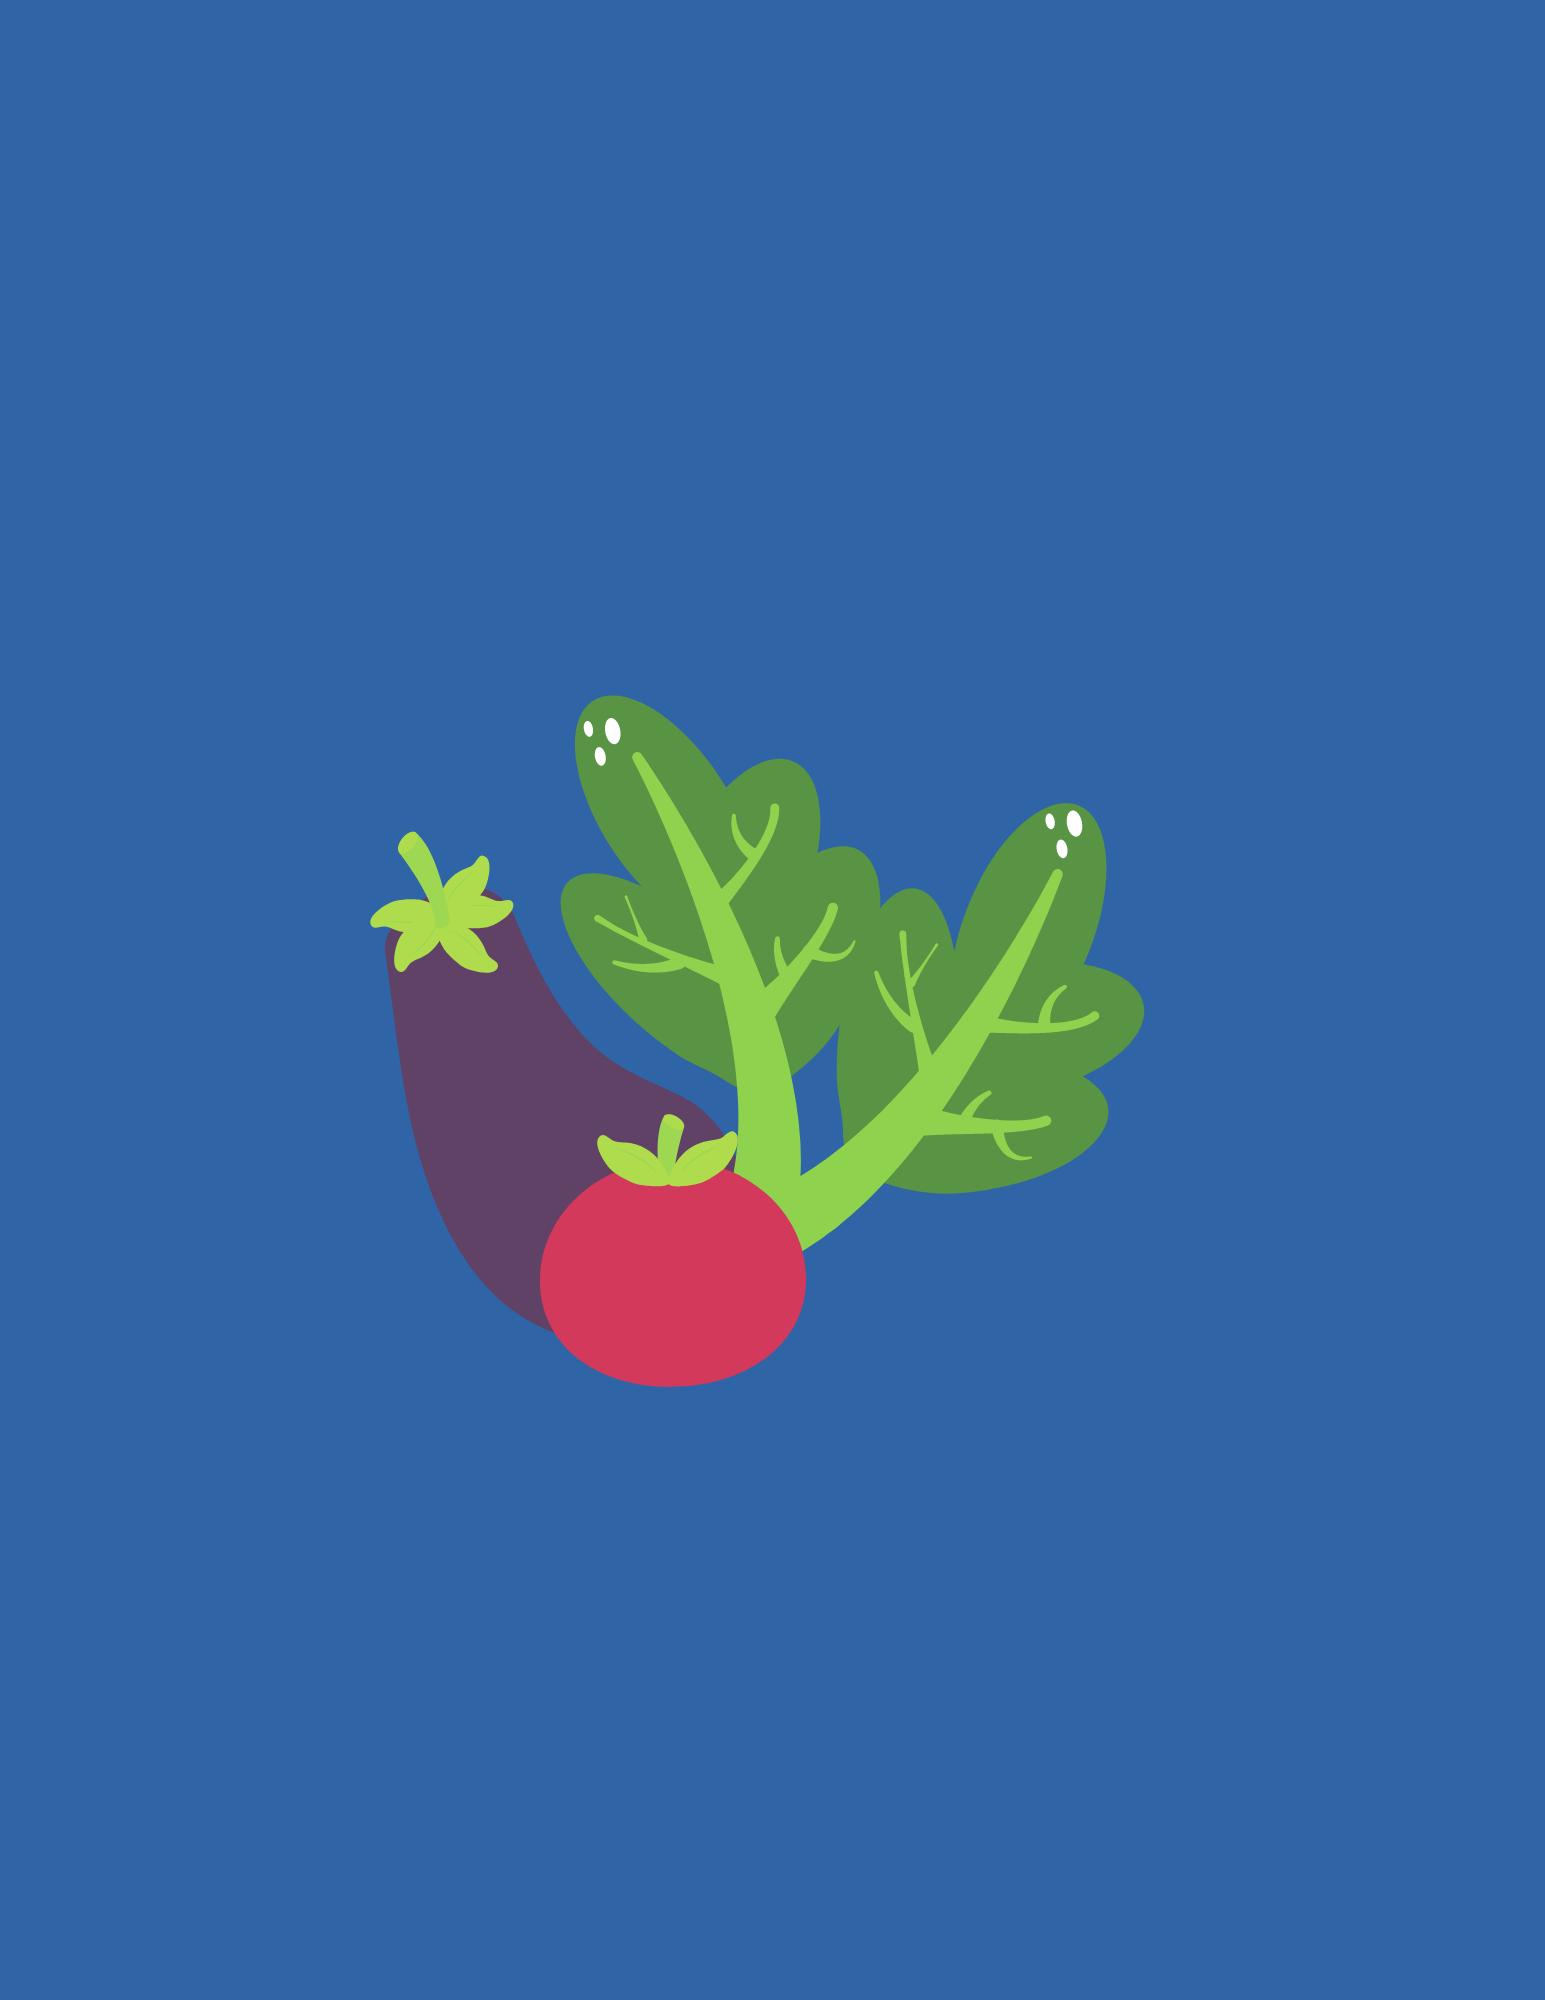 eat_more_fruits_and_veggies